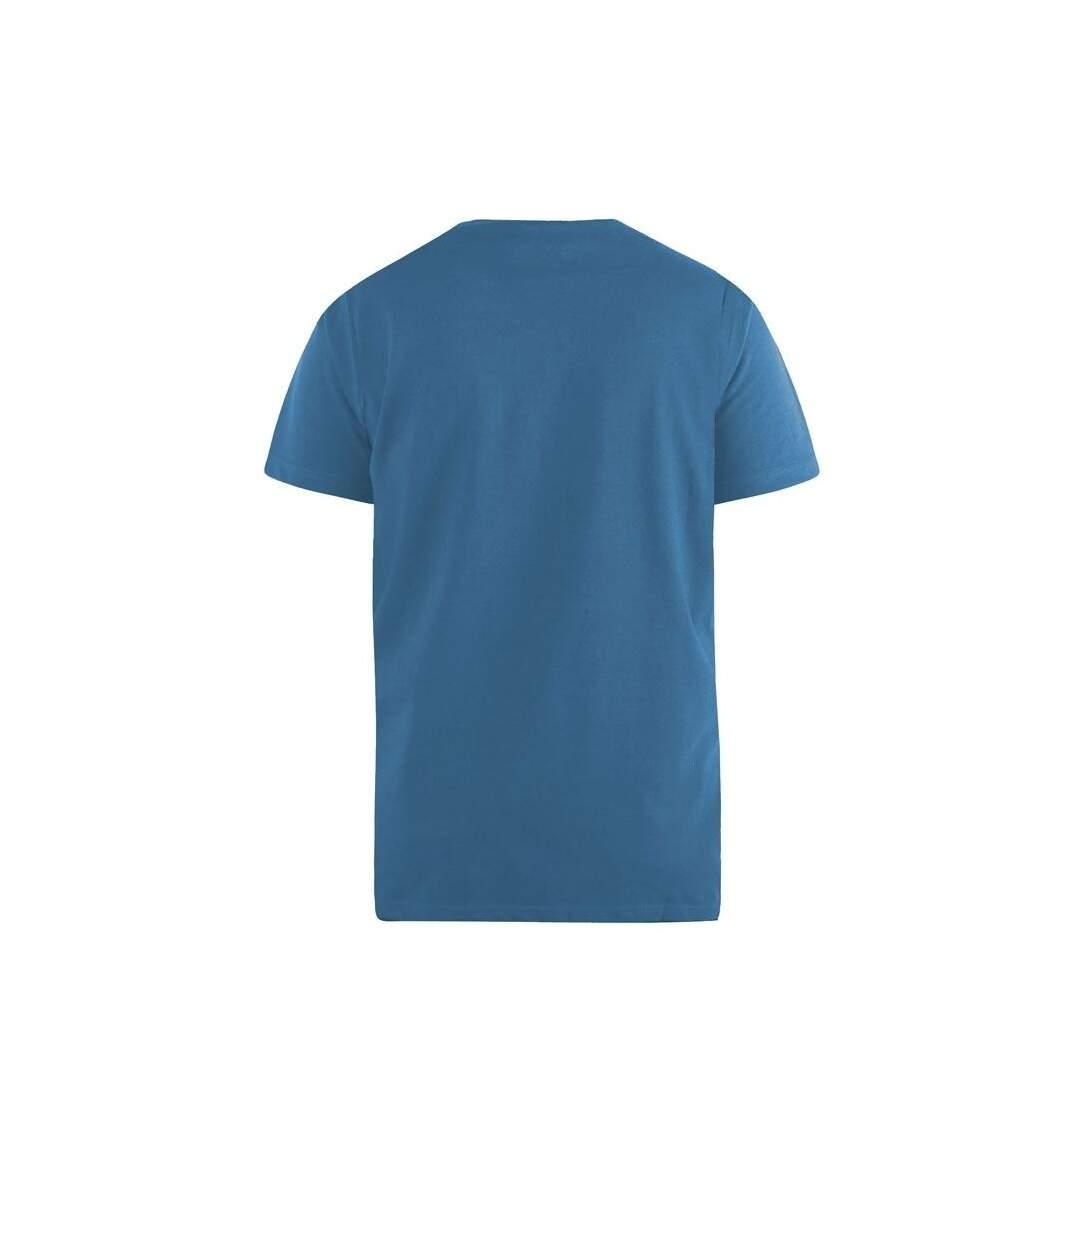 Duke Mens Signature-2 V-Neck T-Shirt (Teal) - UTDC167